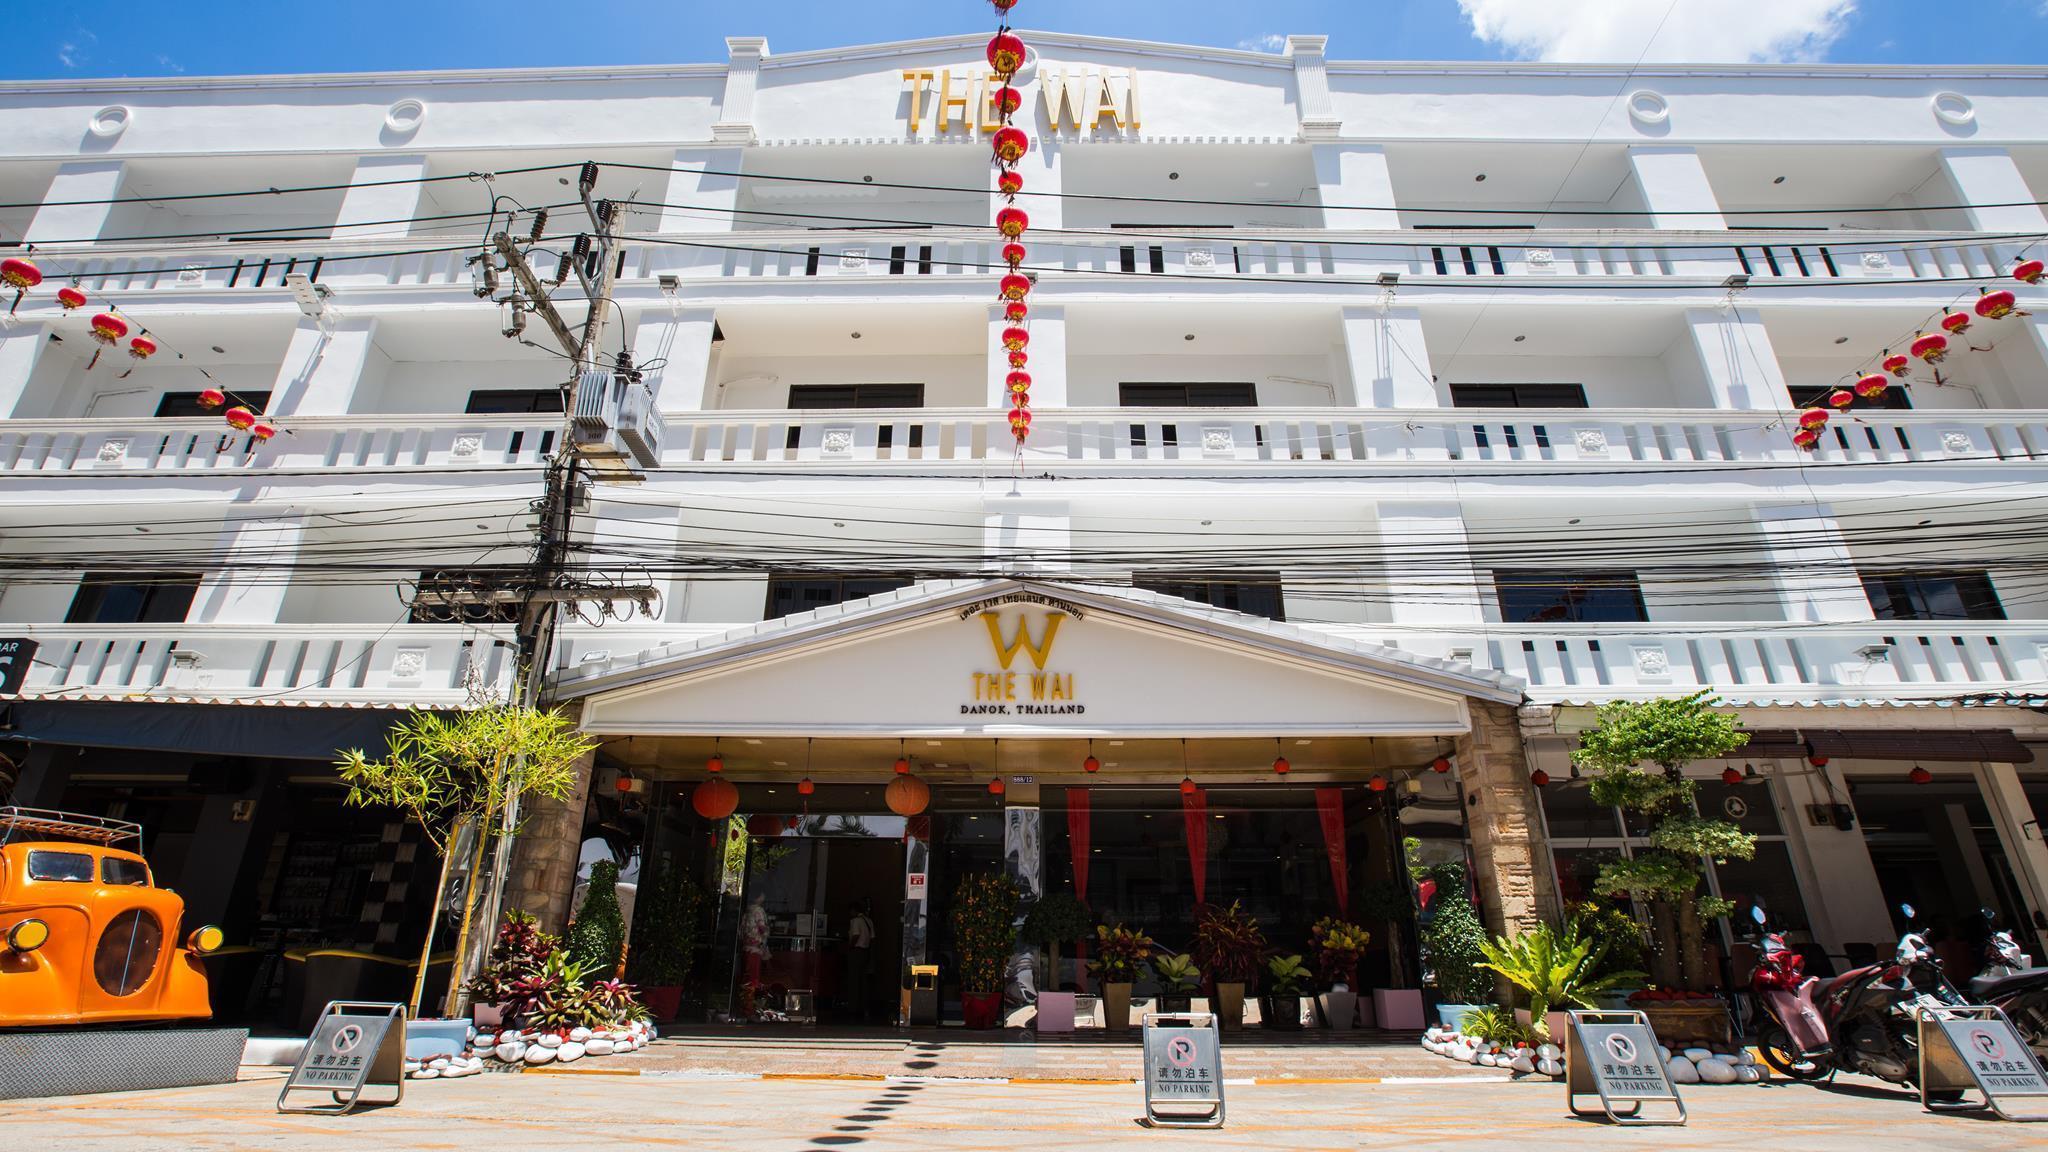 The Wai Hotel Danok, Sadao